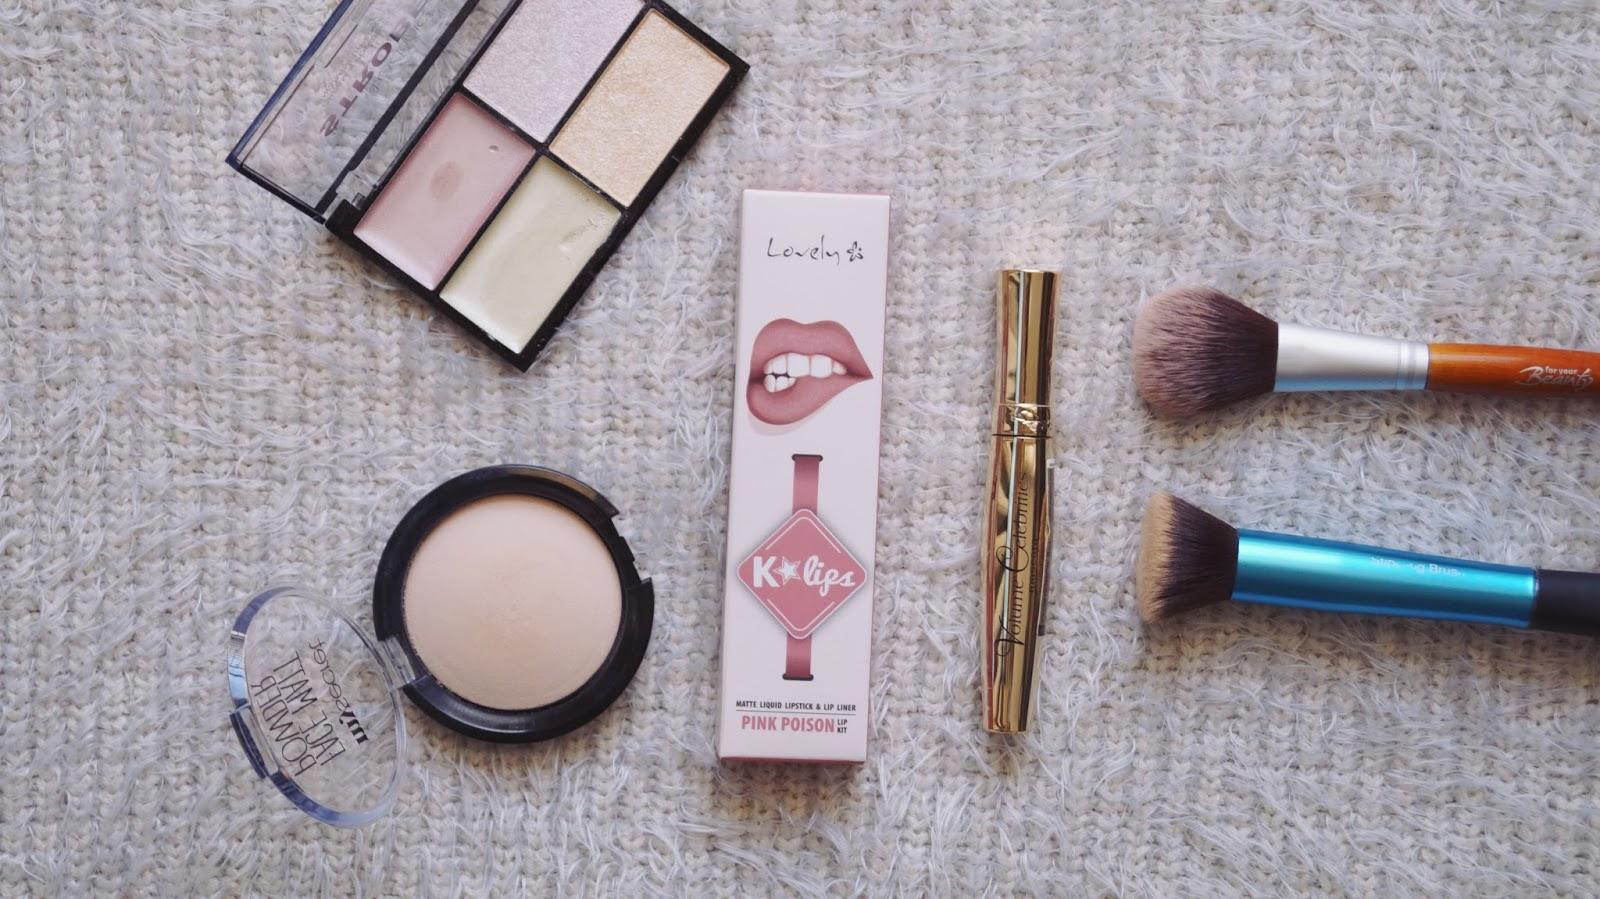 K*Lips od Lovely w kolorze Pink Poison - moja opinia